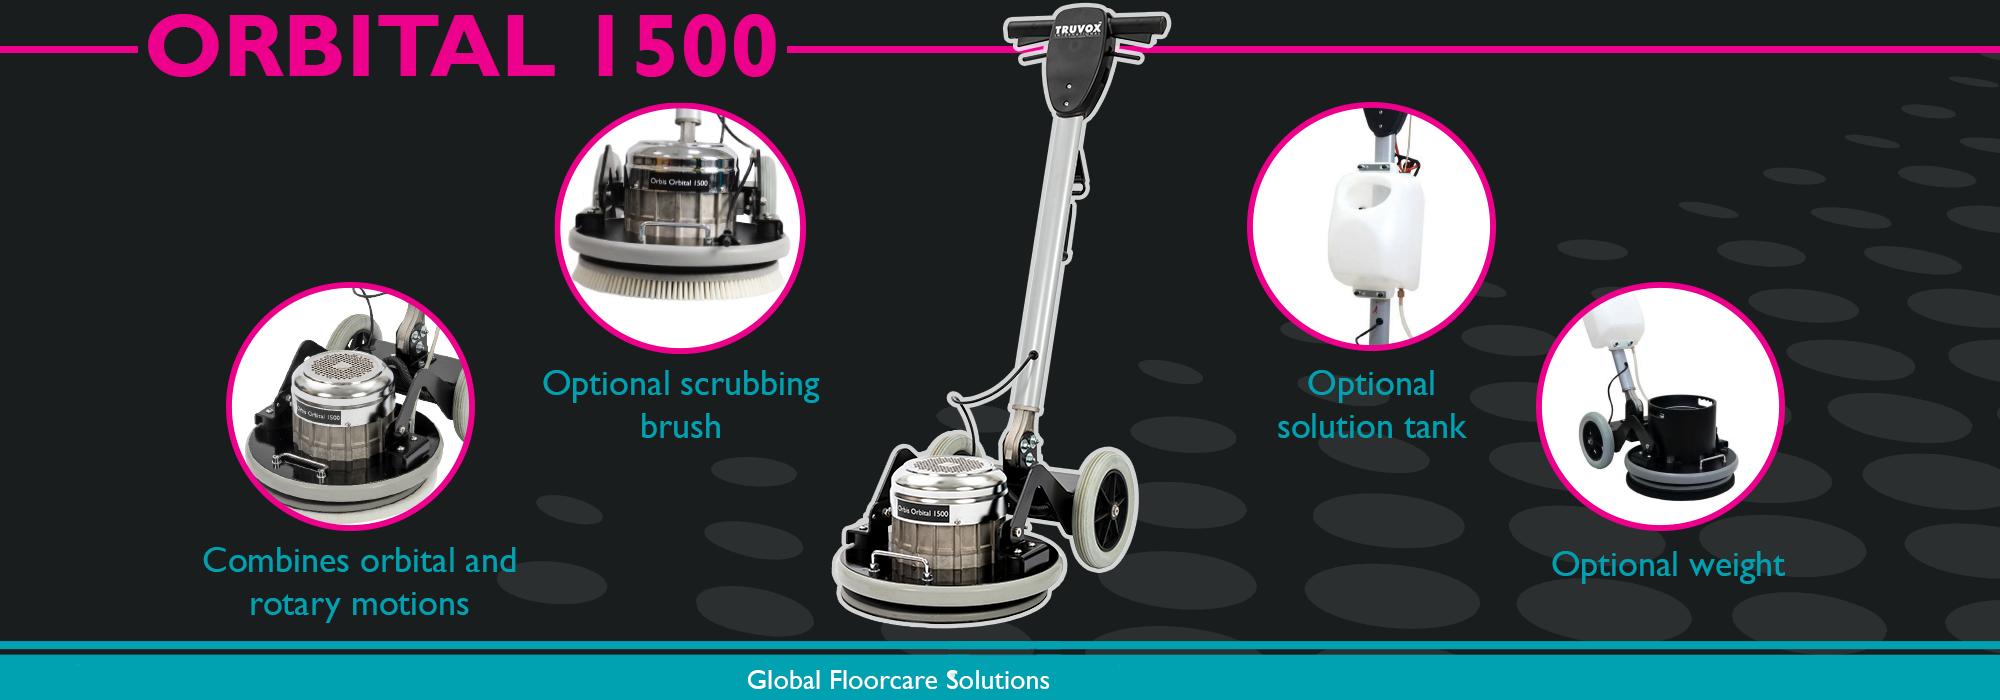 Orbital 1500